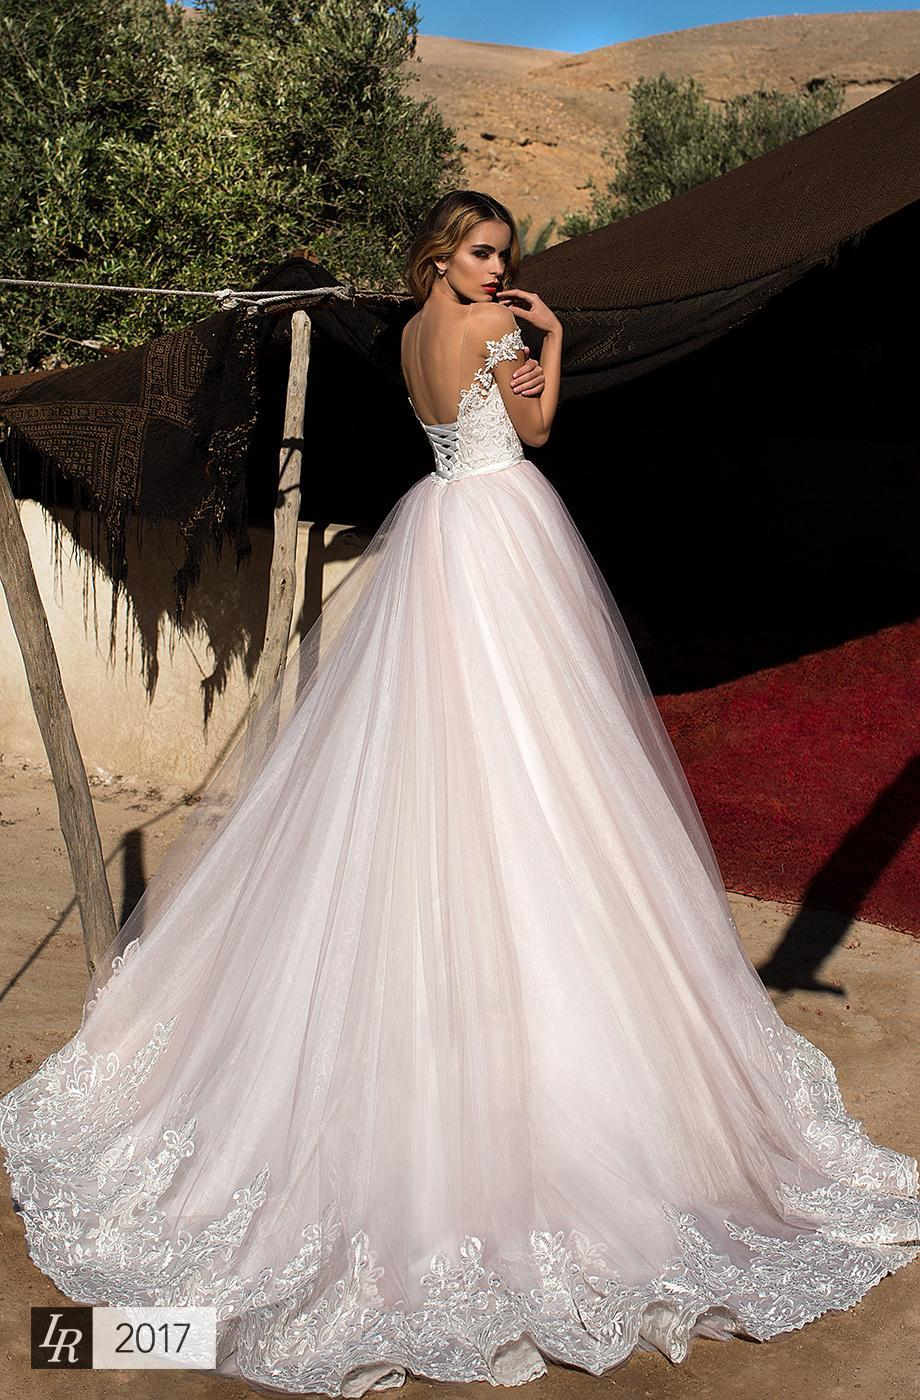 Svadobné šaty značky Lorenzo Rossi - Guvali - Obrázok č. 2